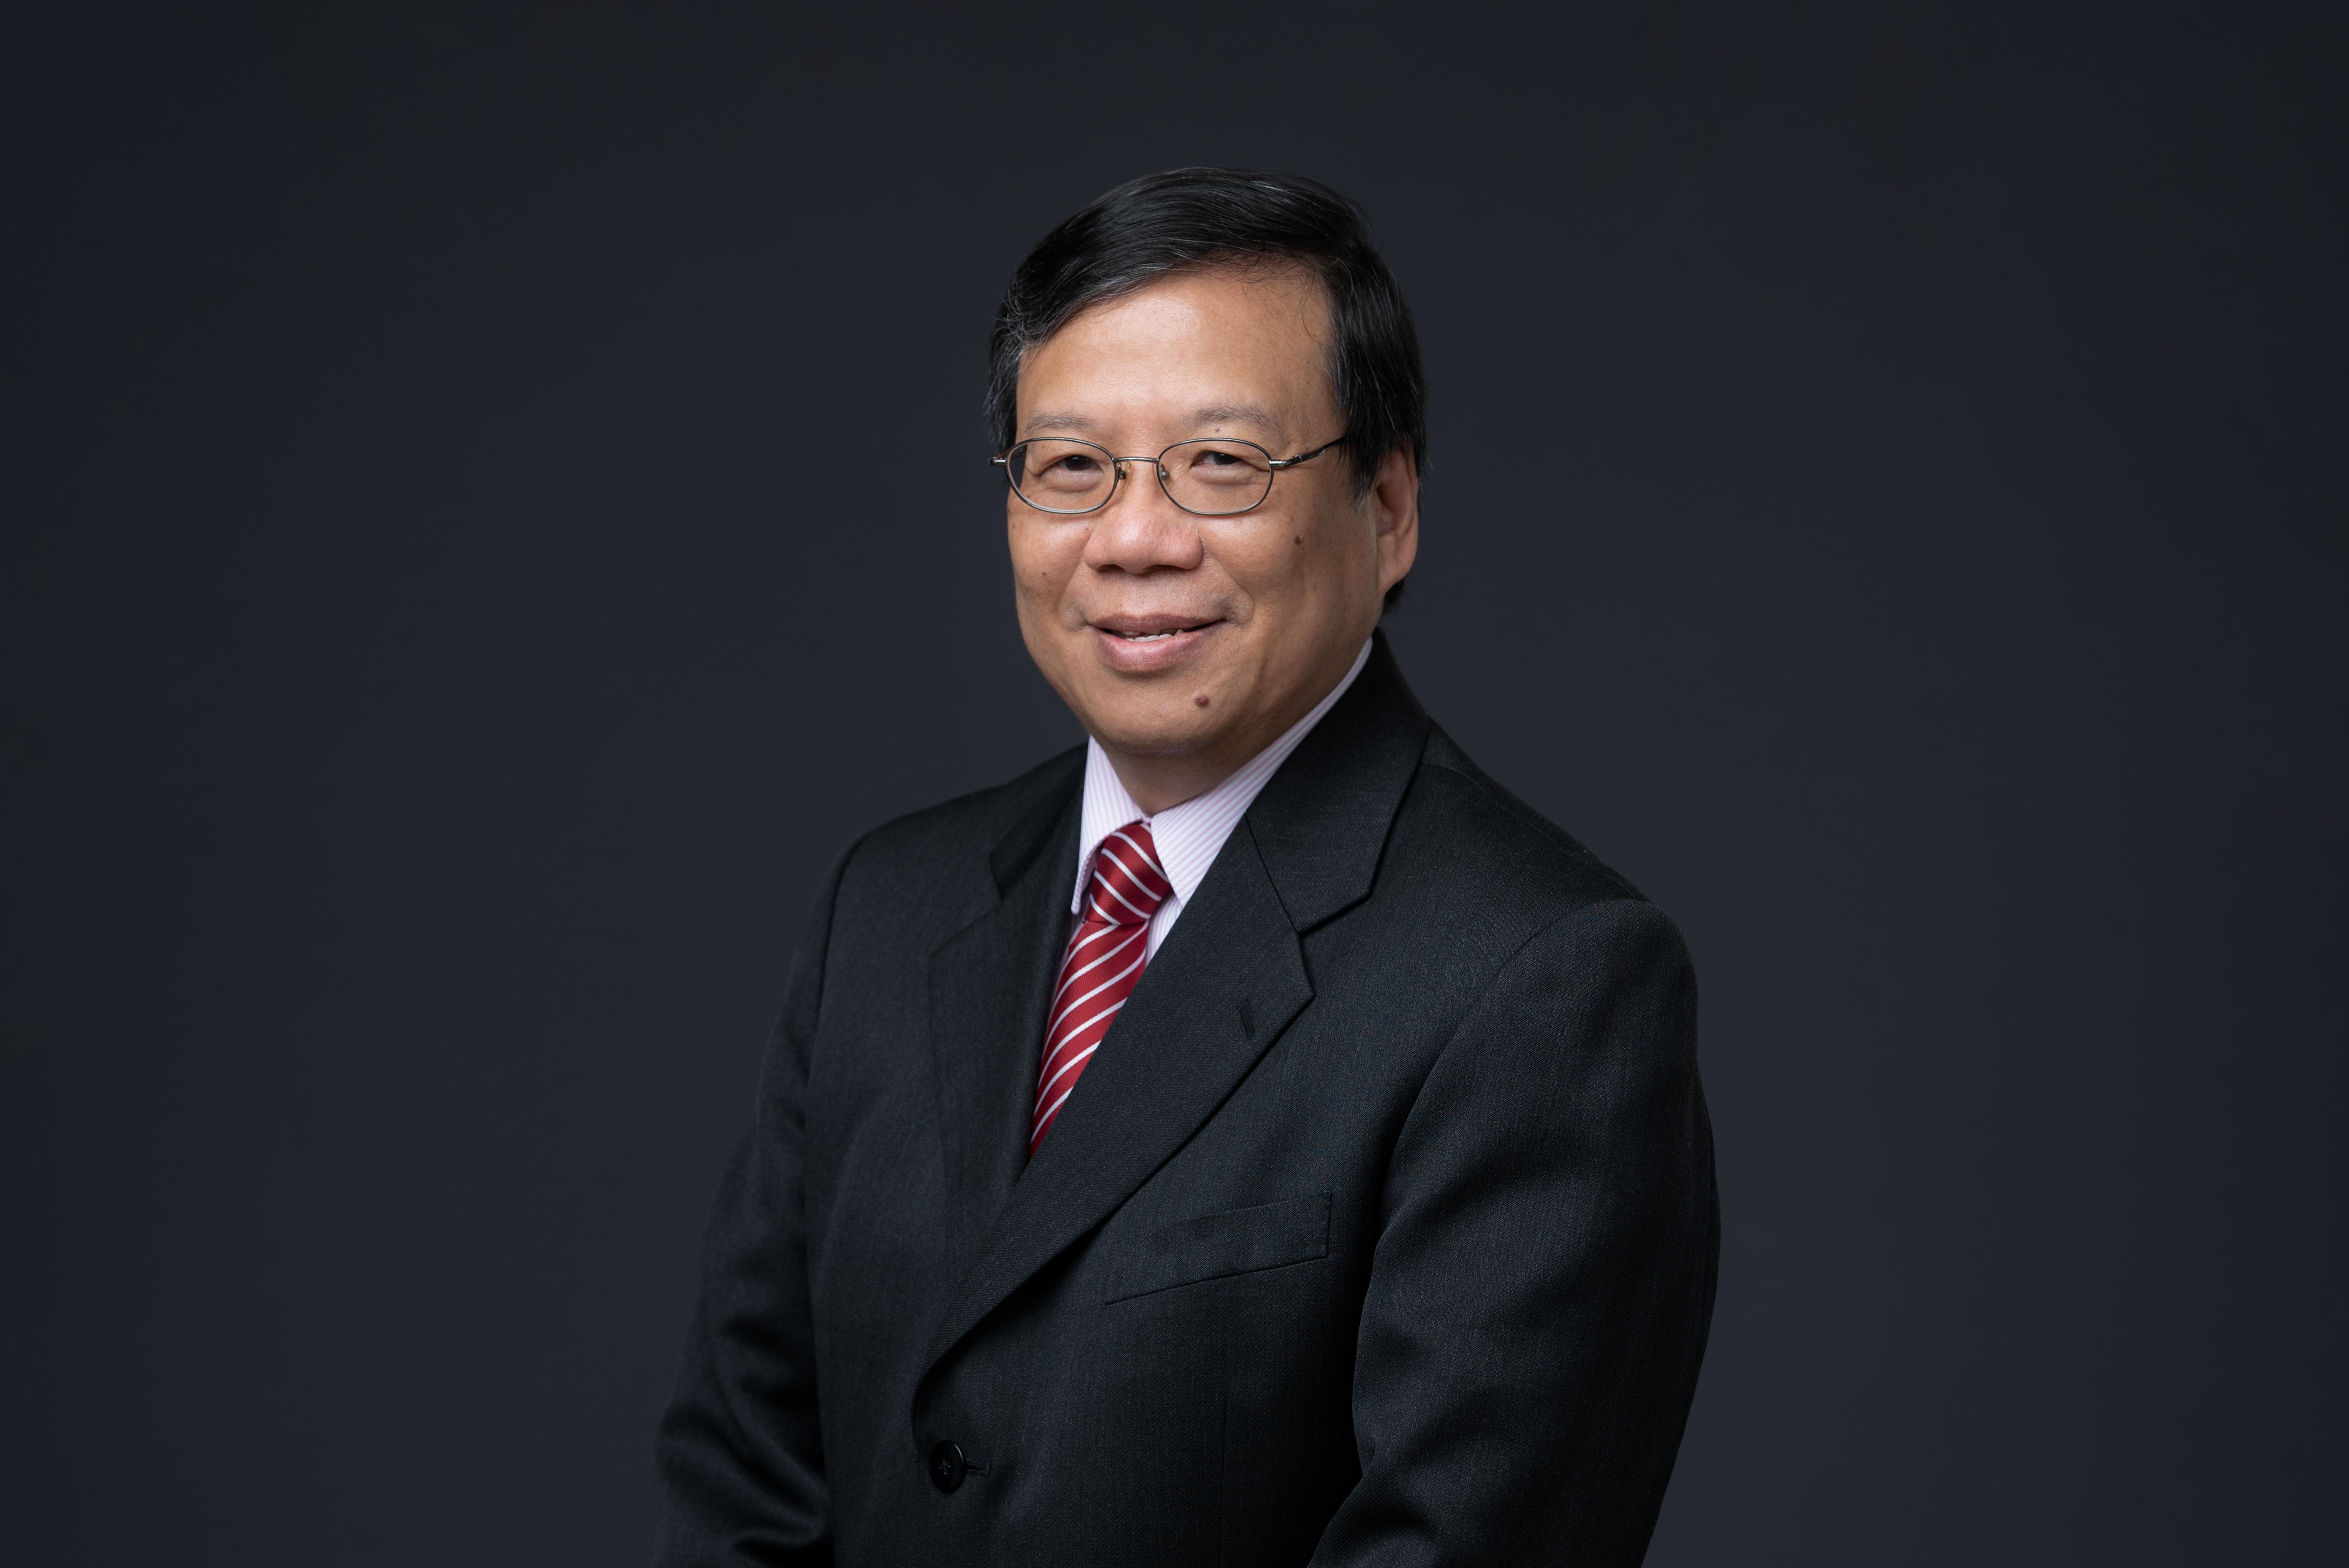 LI Shueng Wai, Leonard profile image